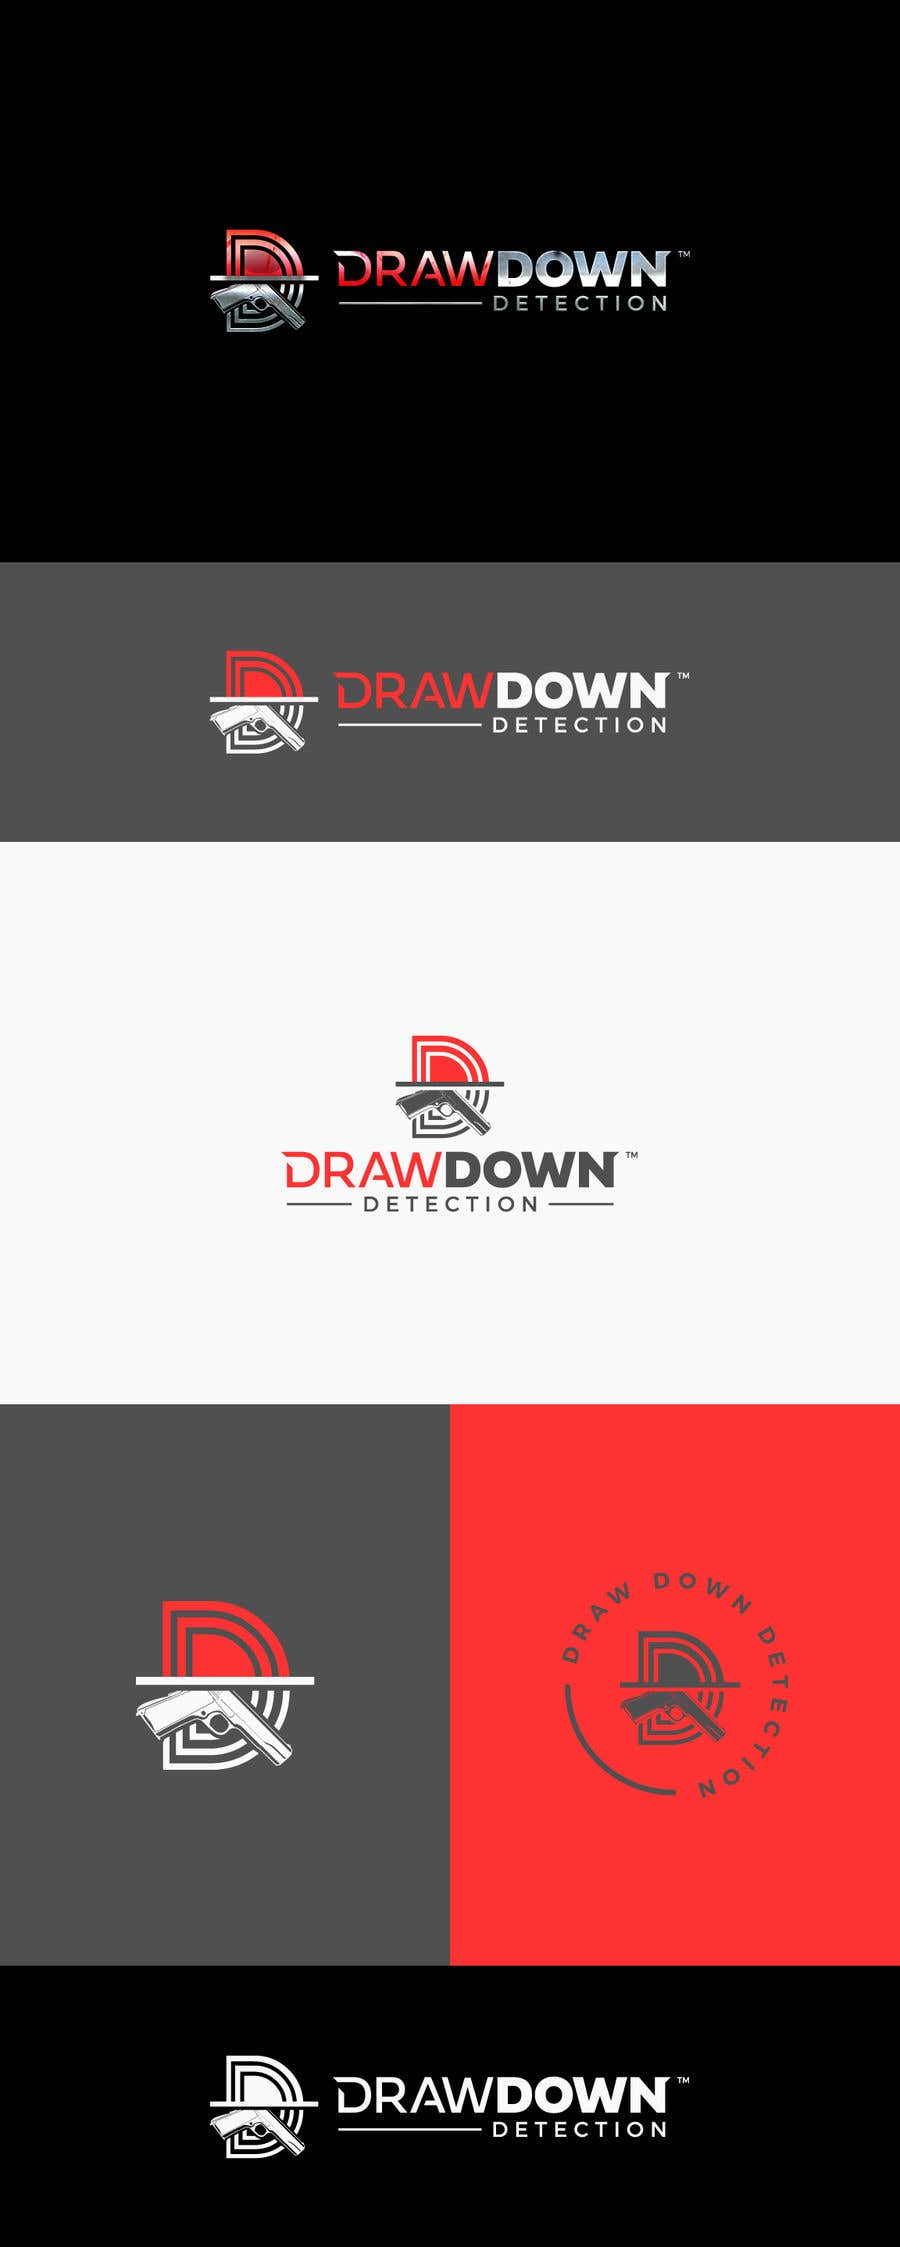 "Intrarea #162 pentru concursul ""Draw Down Detection - Logo"""